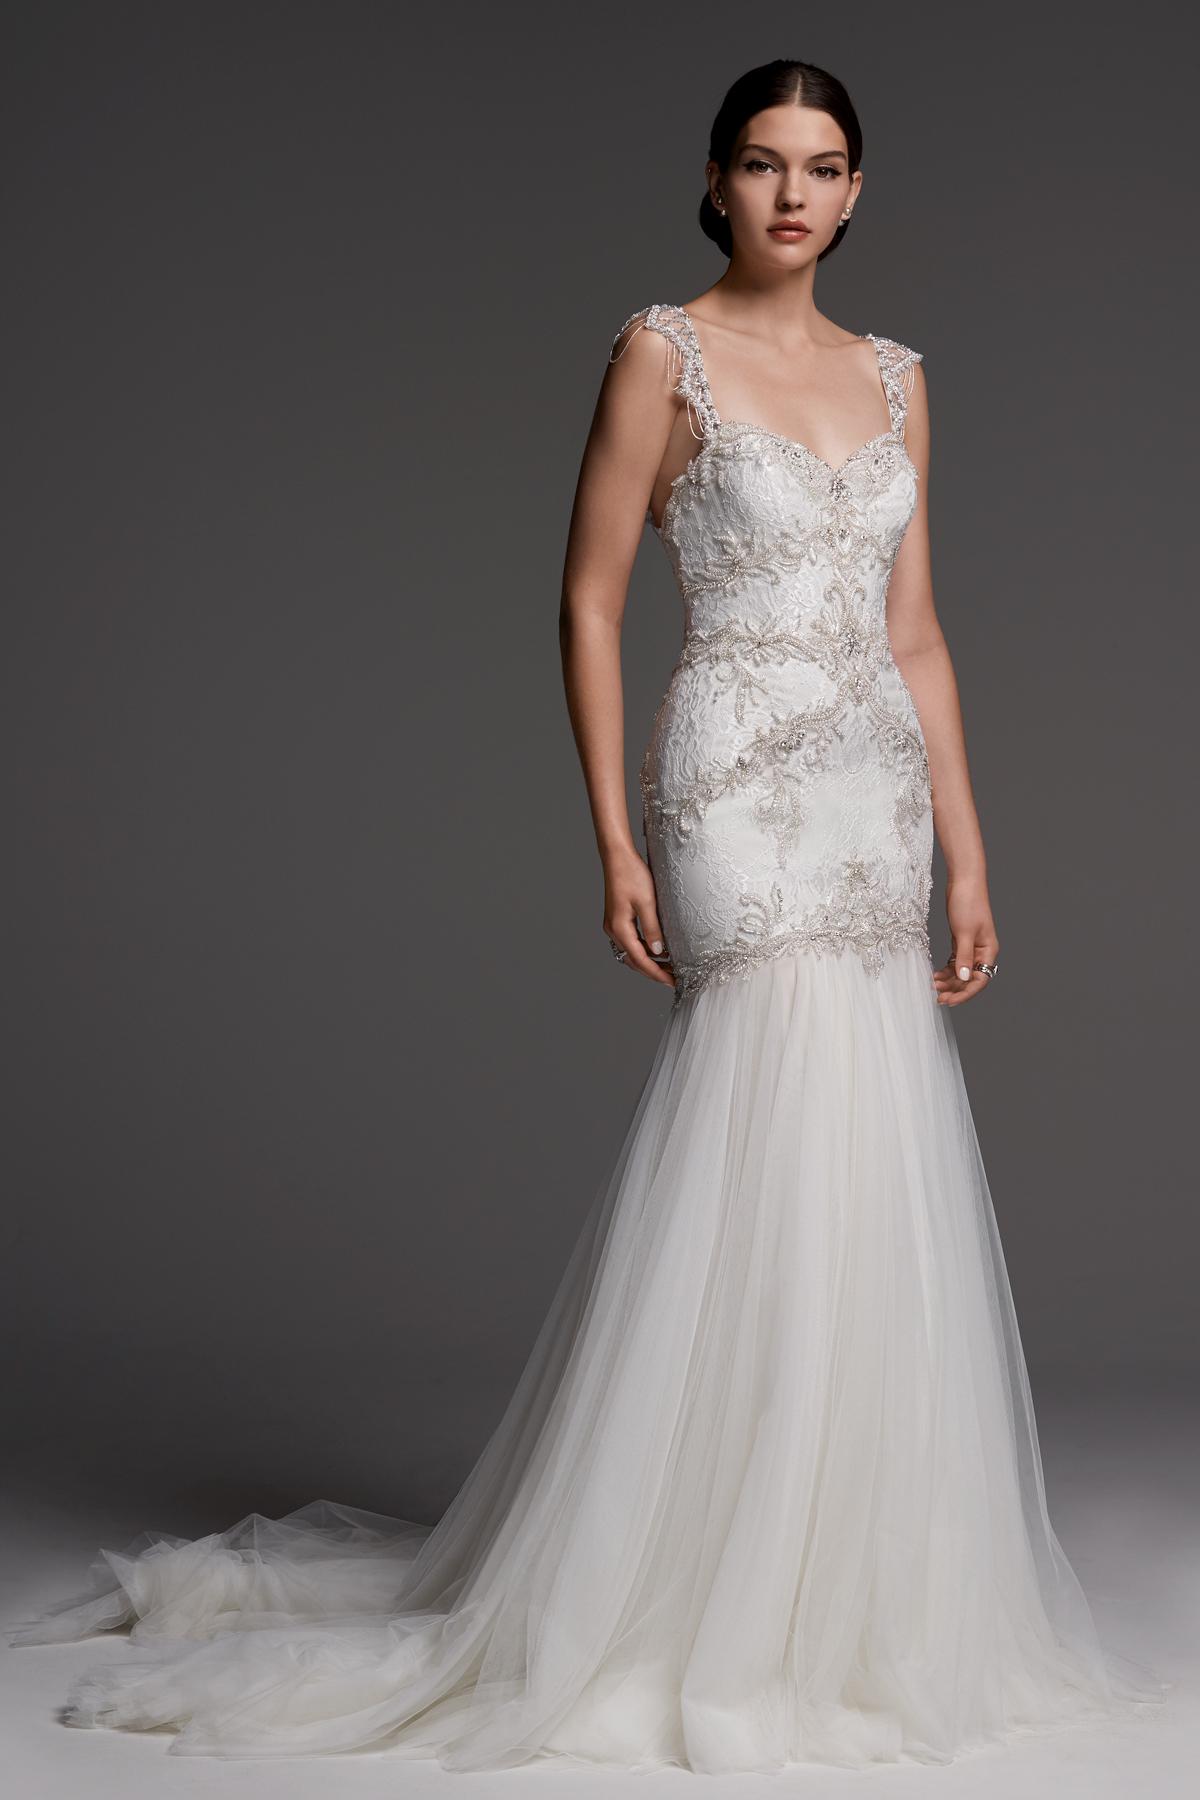 watters wedding dress fall 2018 v-neck mermaid